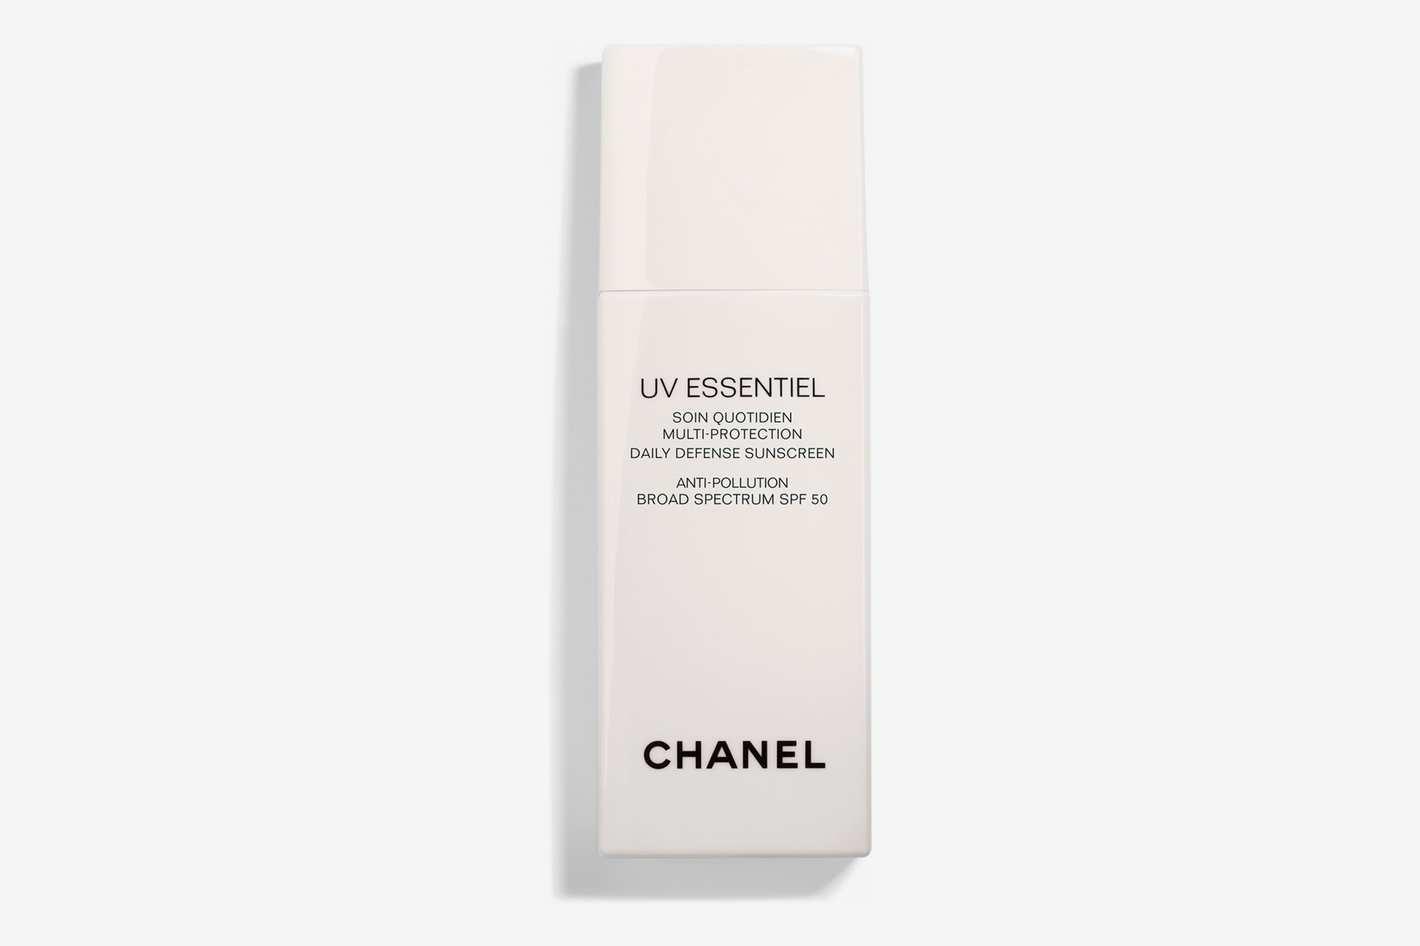 Chanel Beauty UV Essentiel Multi-Protection Daily Defense Sunscreen Anti-Pollution Broad Spectrum SPF 50